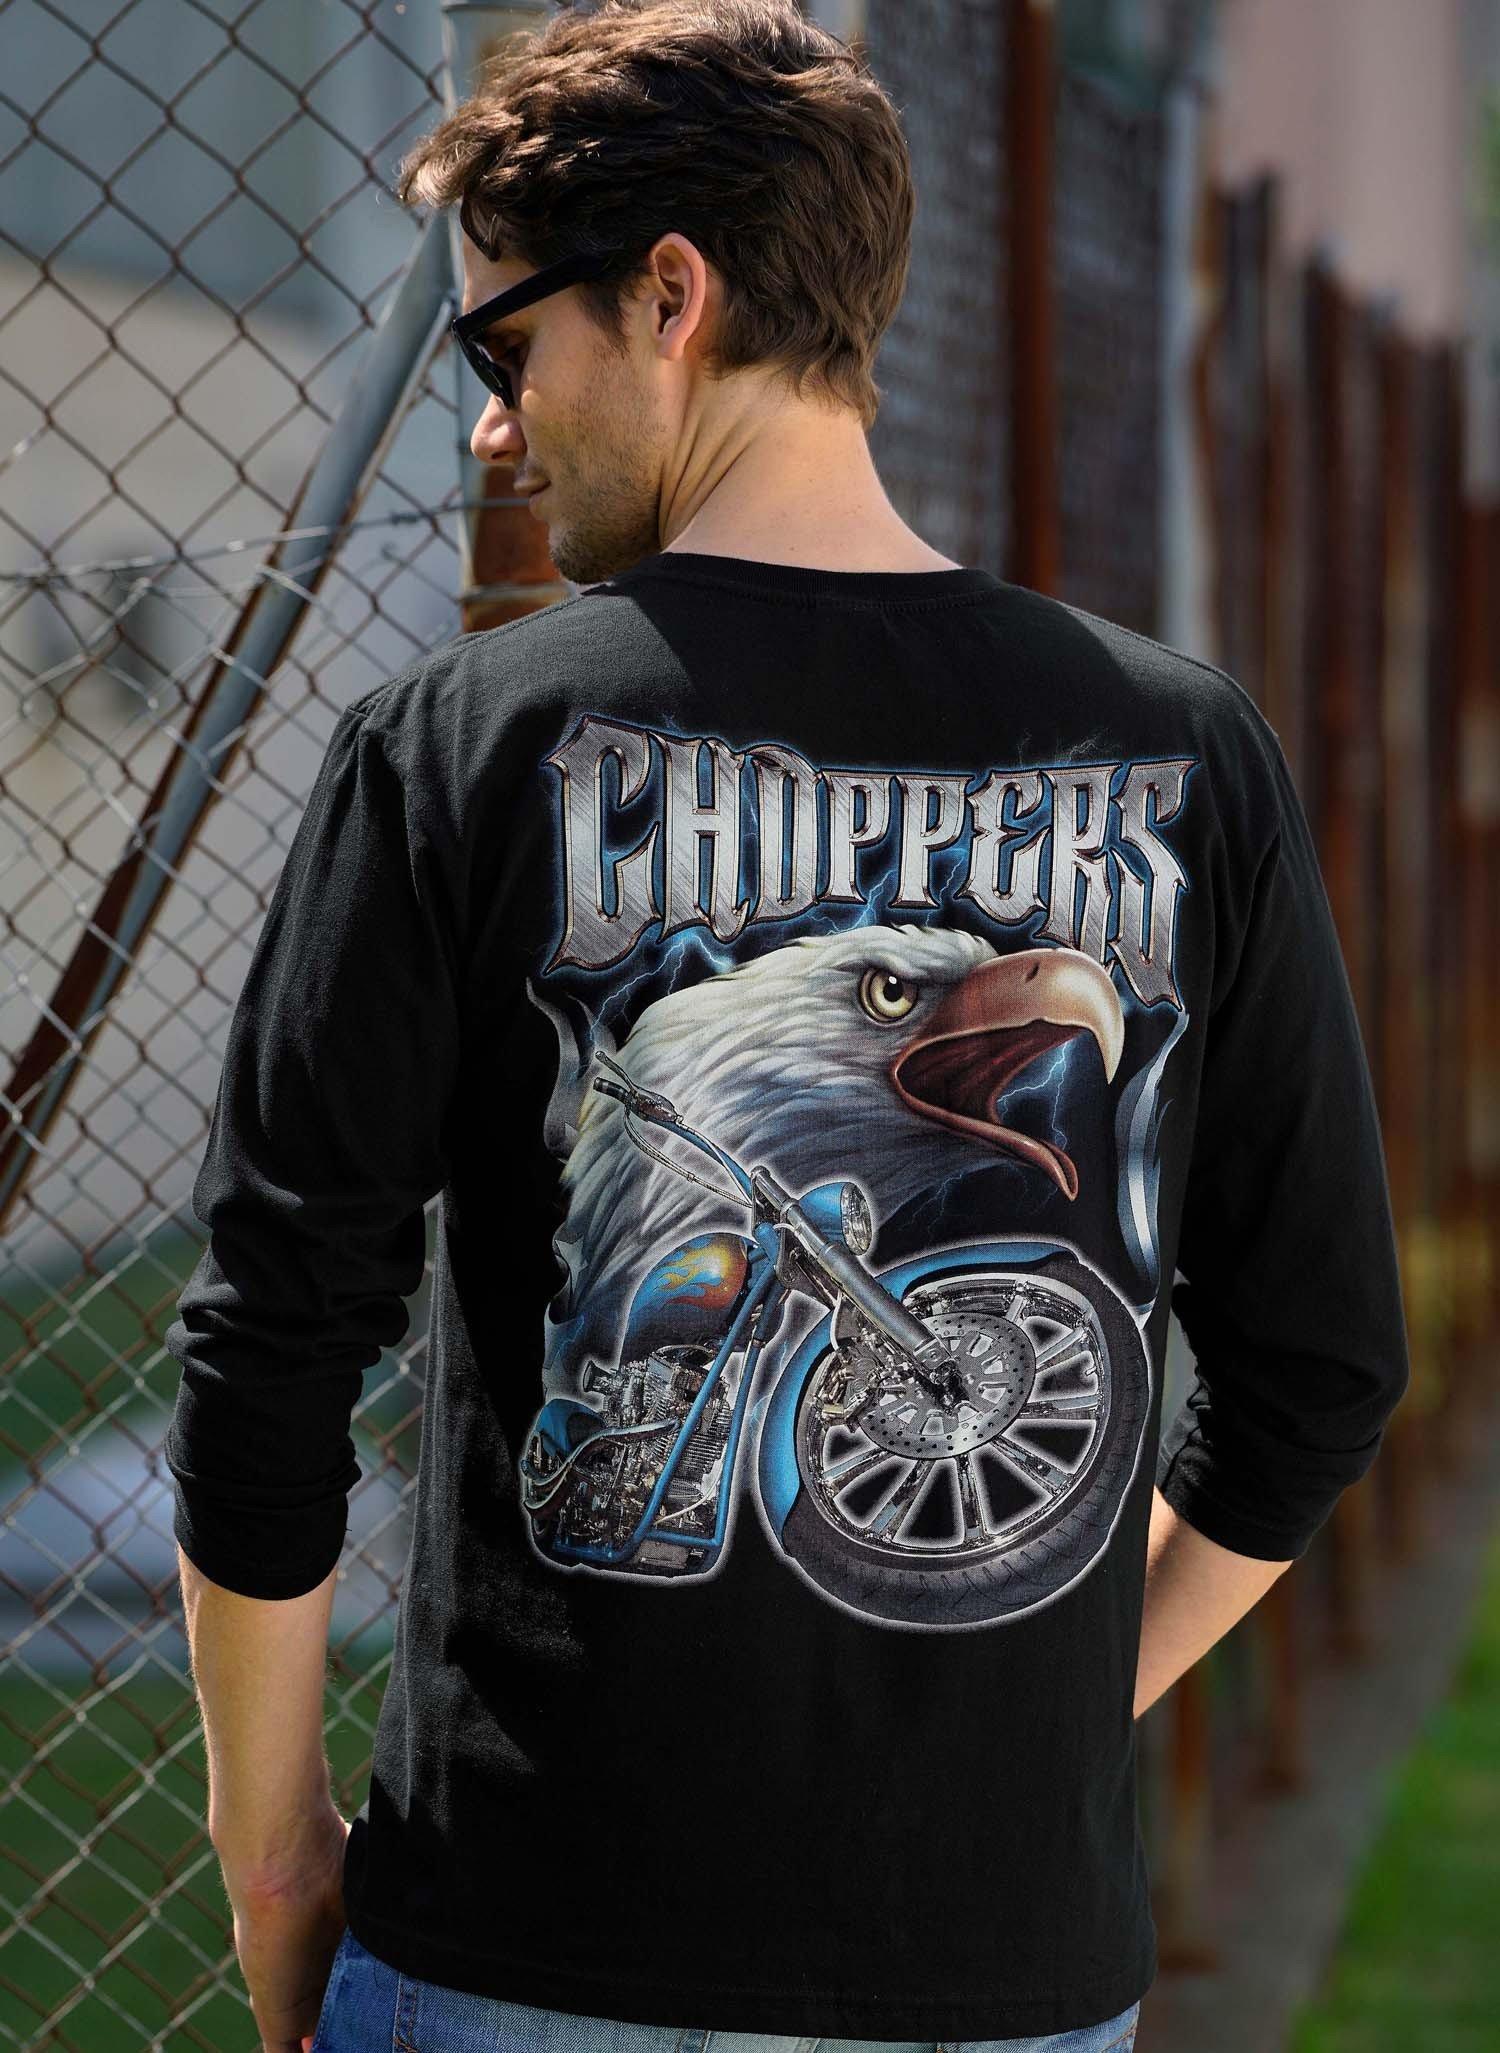 H-LA-Shirt,Adler/Bike, schwarz XXL 010 - 2 - Ronja.ch